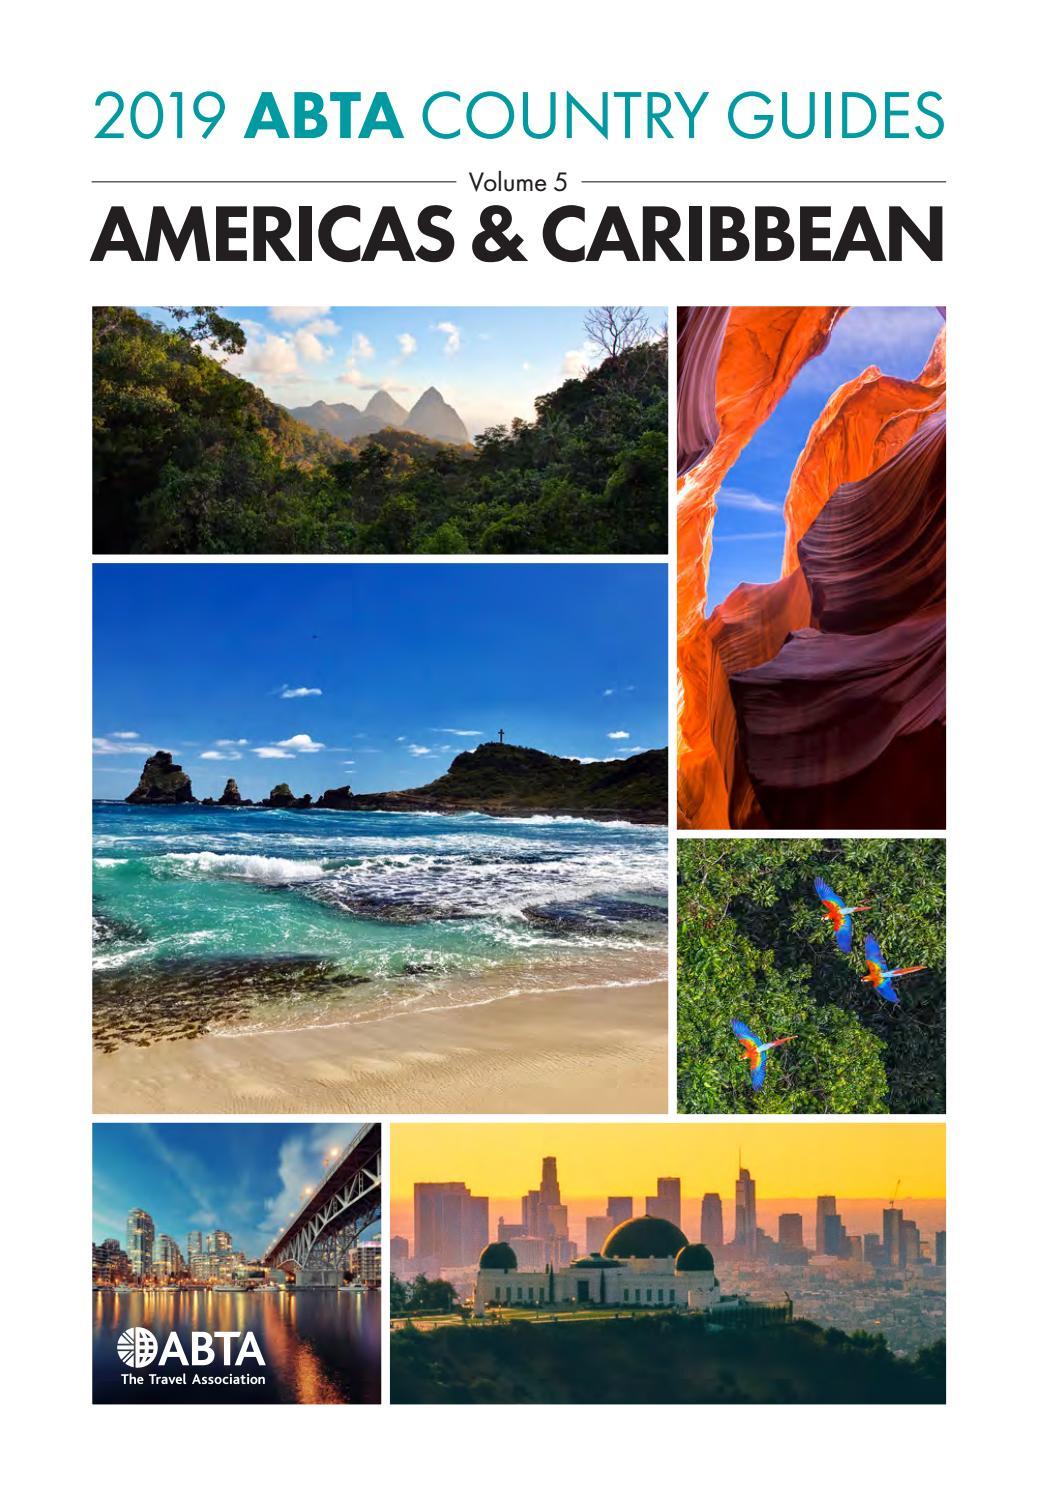 7ad454ea4 2019 ABTA Country Guides: Americas & Caribbean by ABTA Magazine - issuu